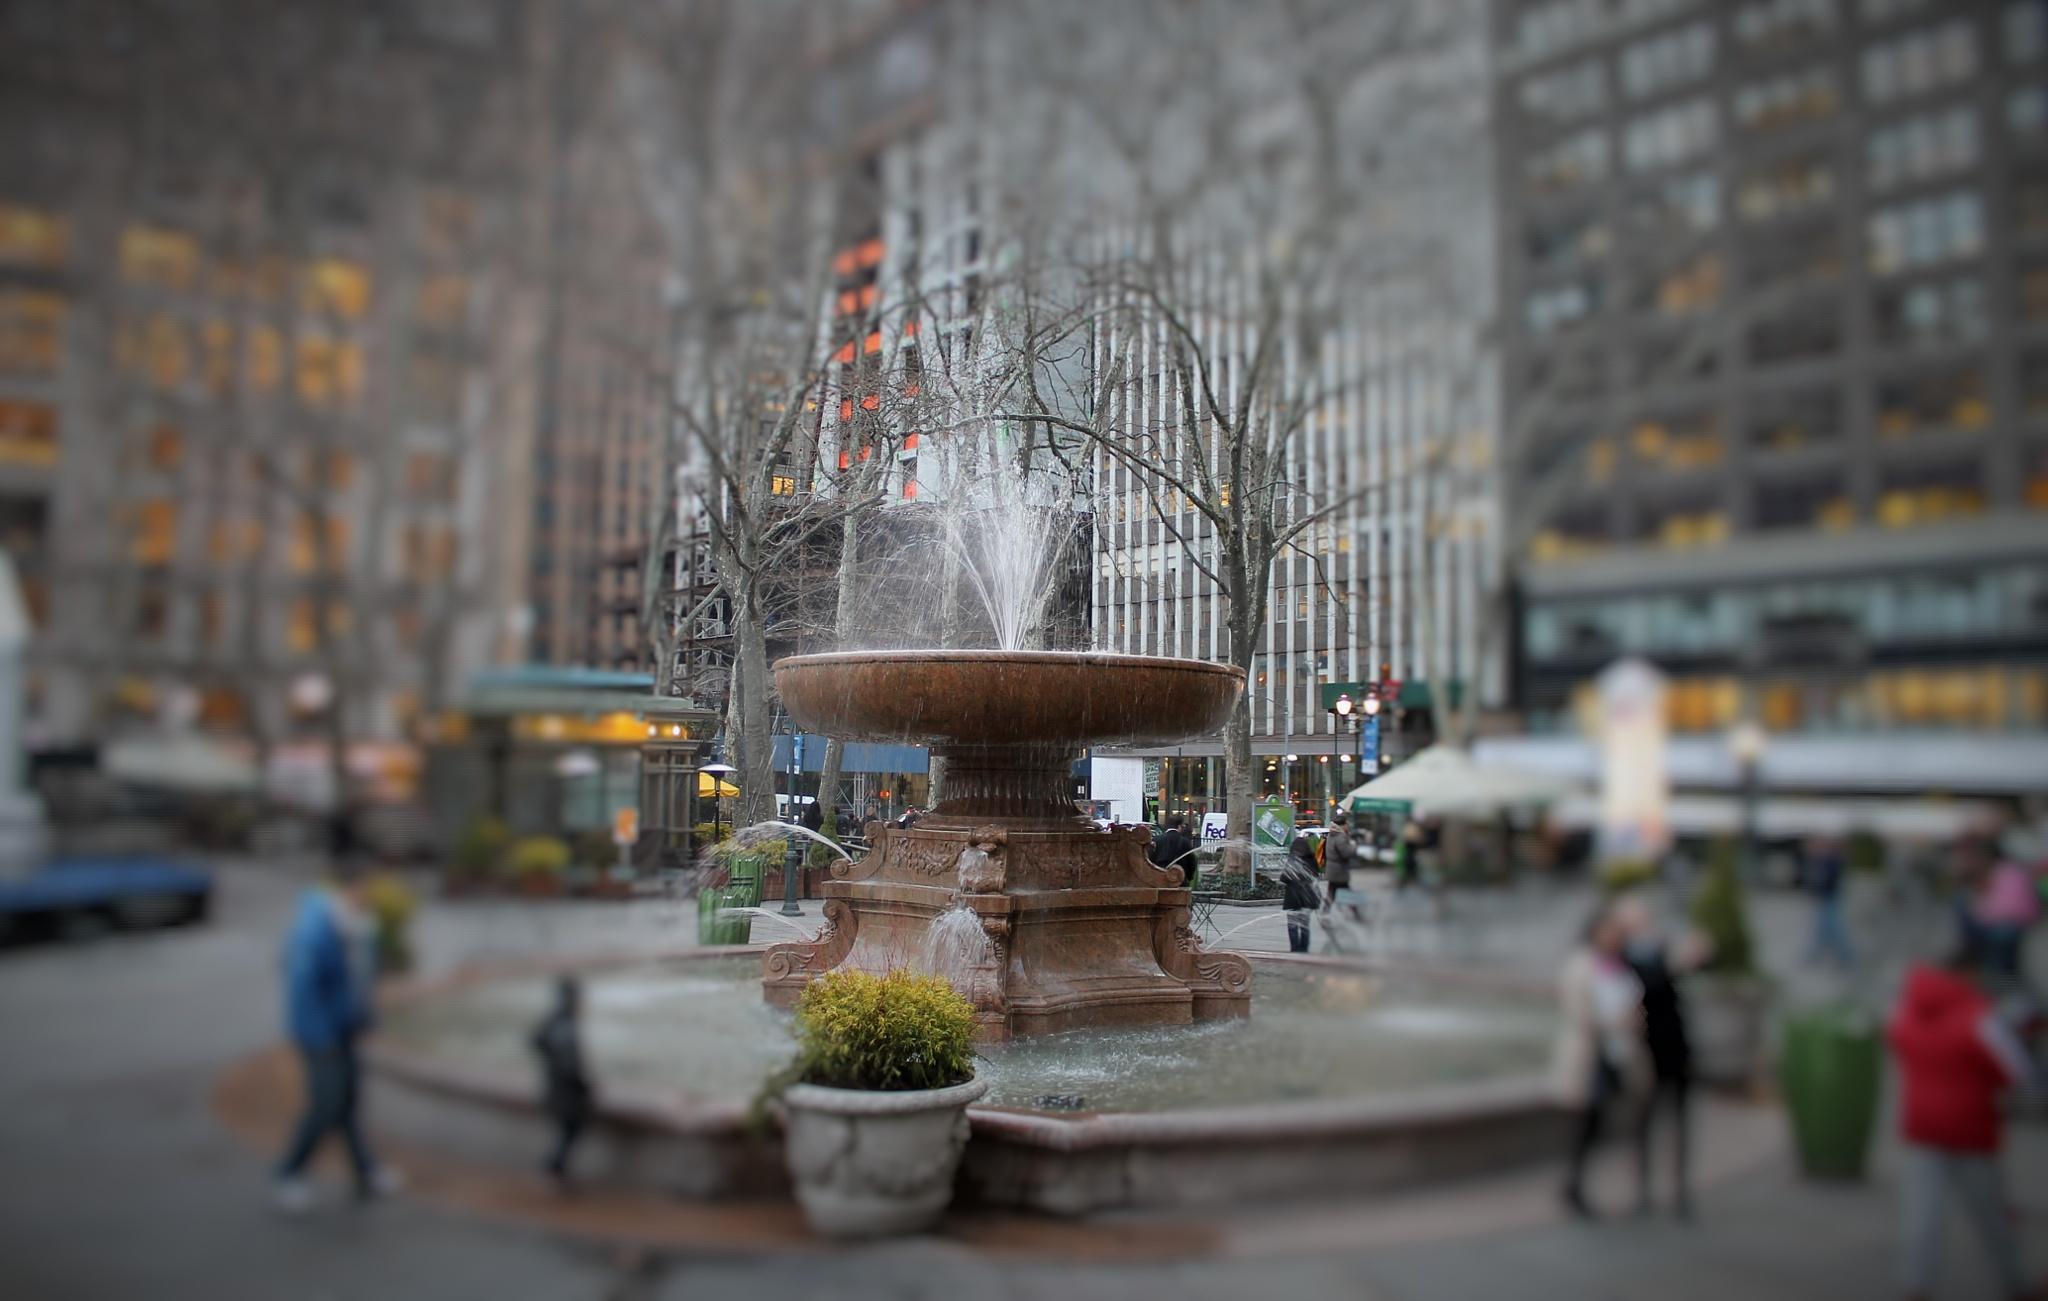 Bryant Park fontaine, by Liborio Drogo